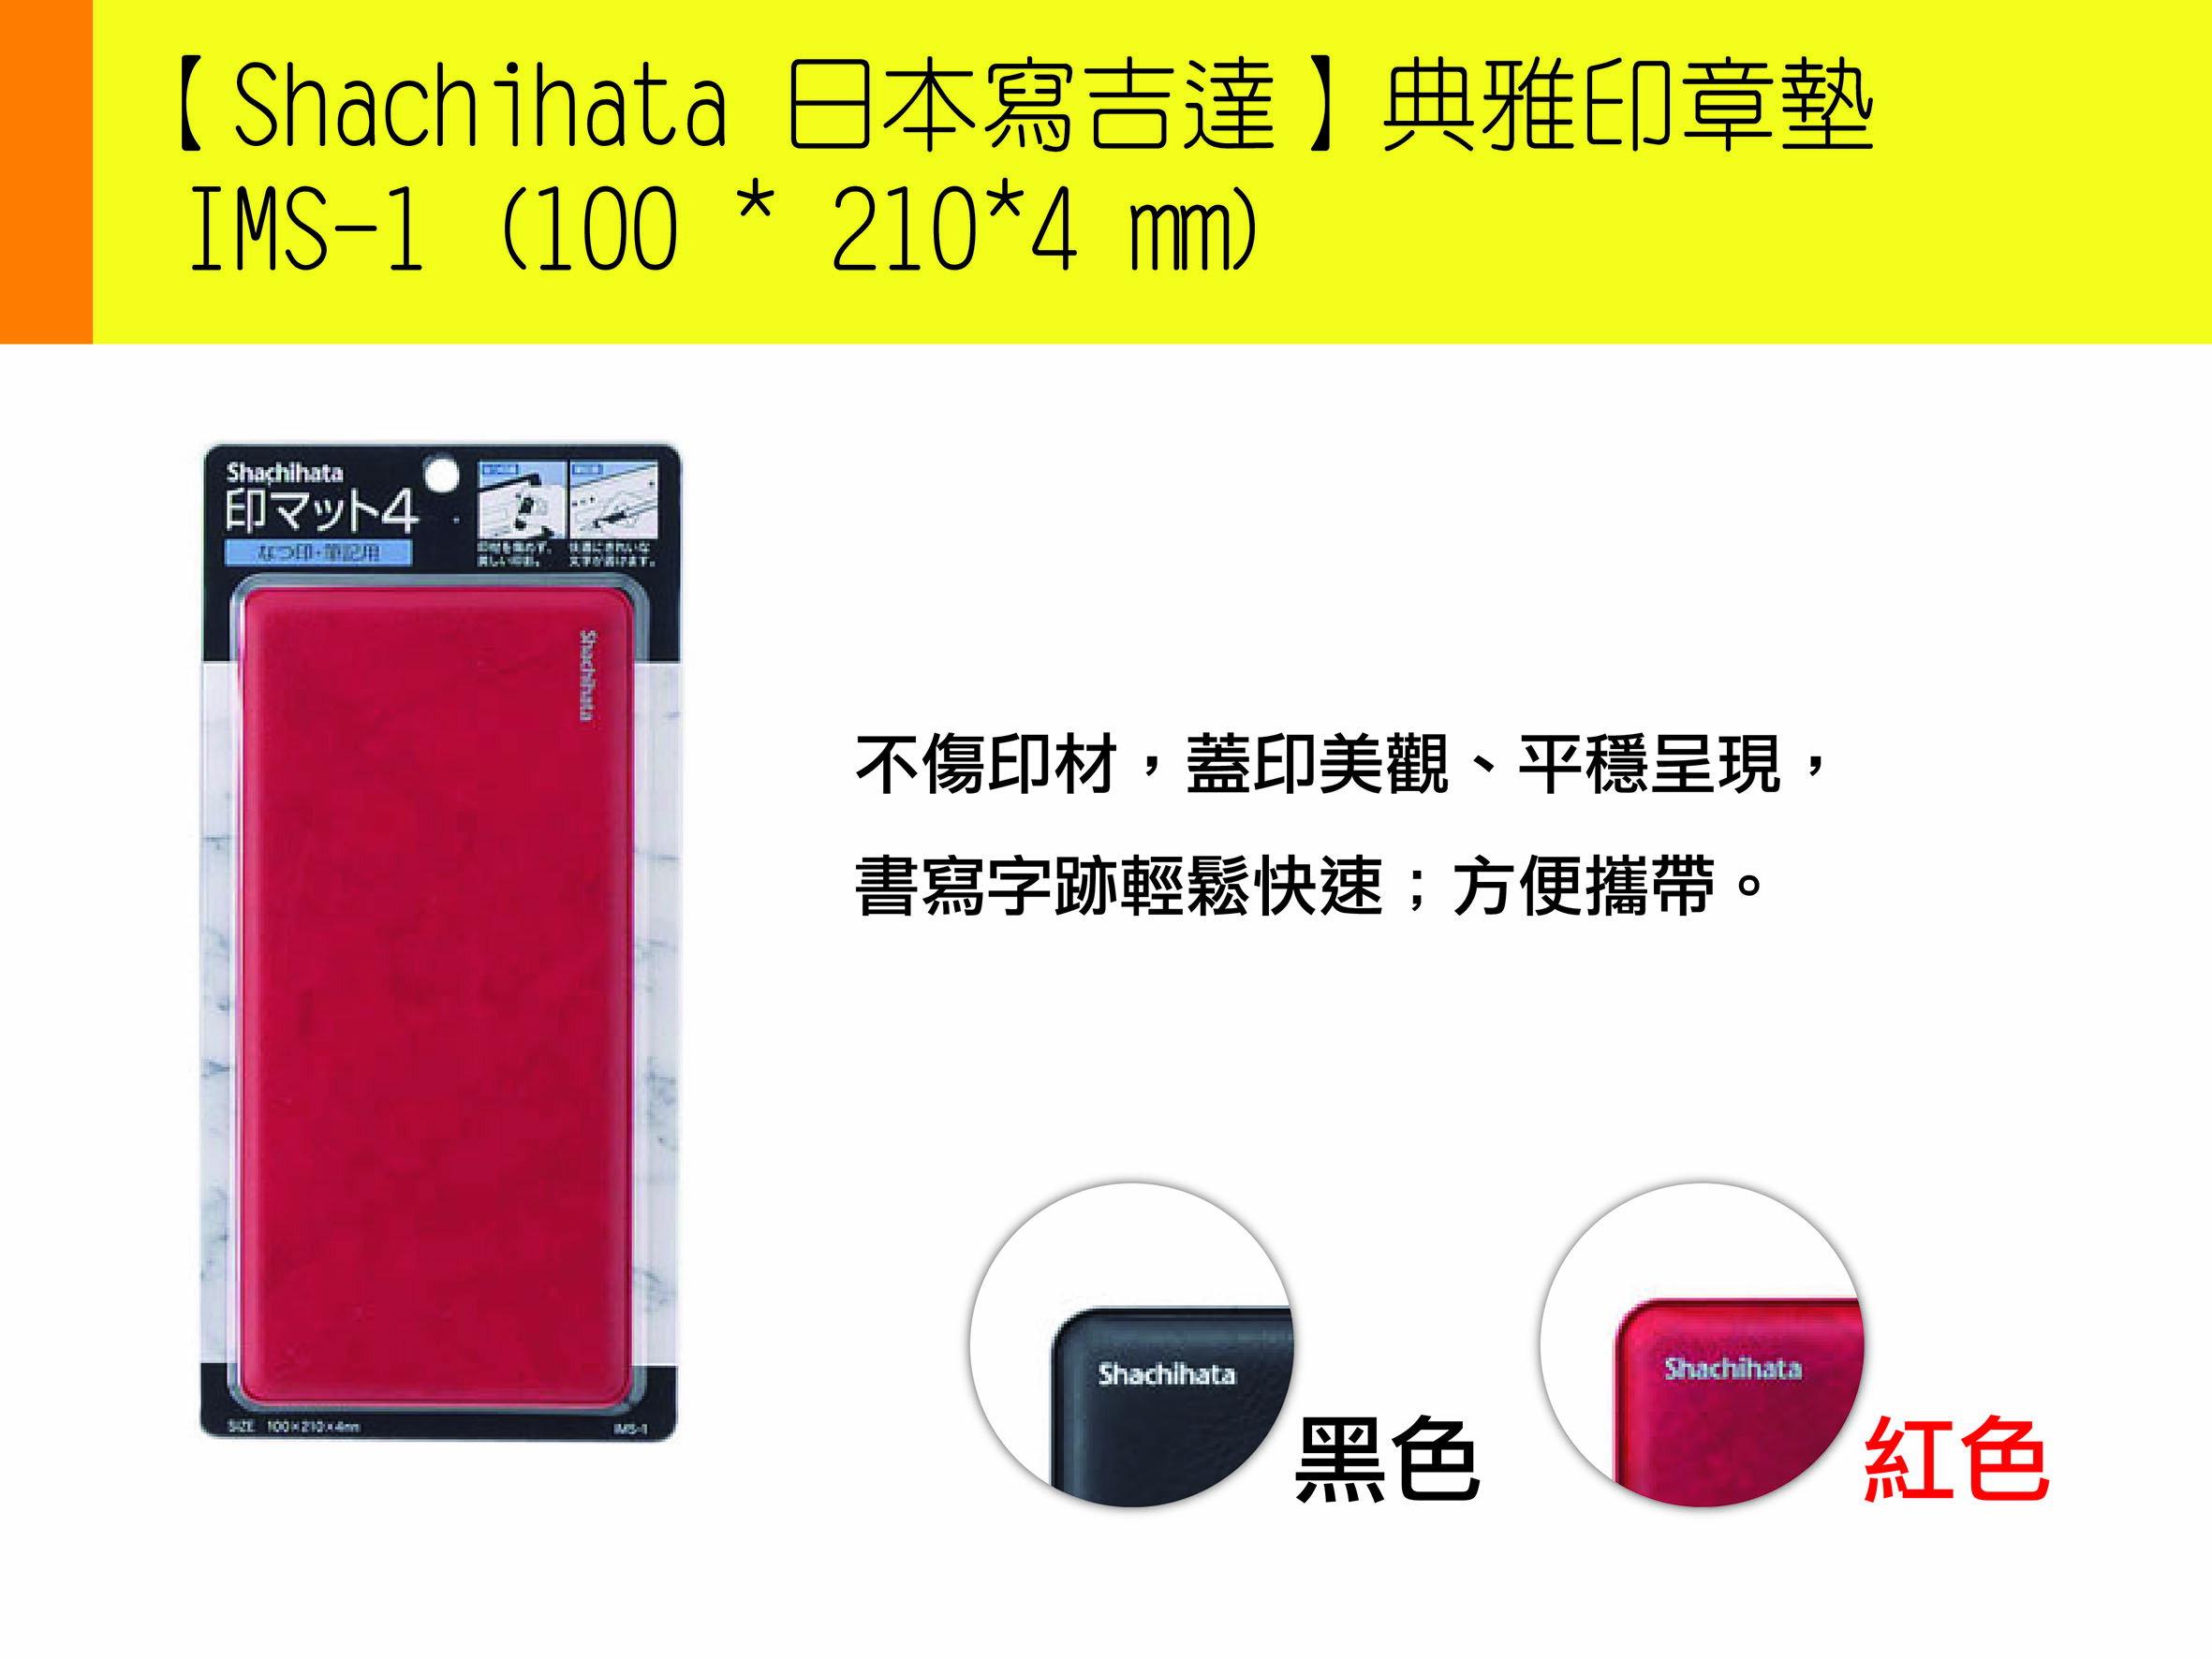 【Shachihata 日本寫吉達】典雅印章墊IMS-1 (100 * 210*4 mm)